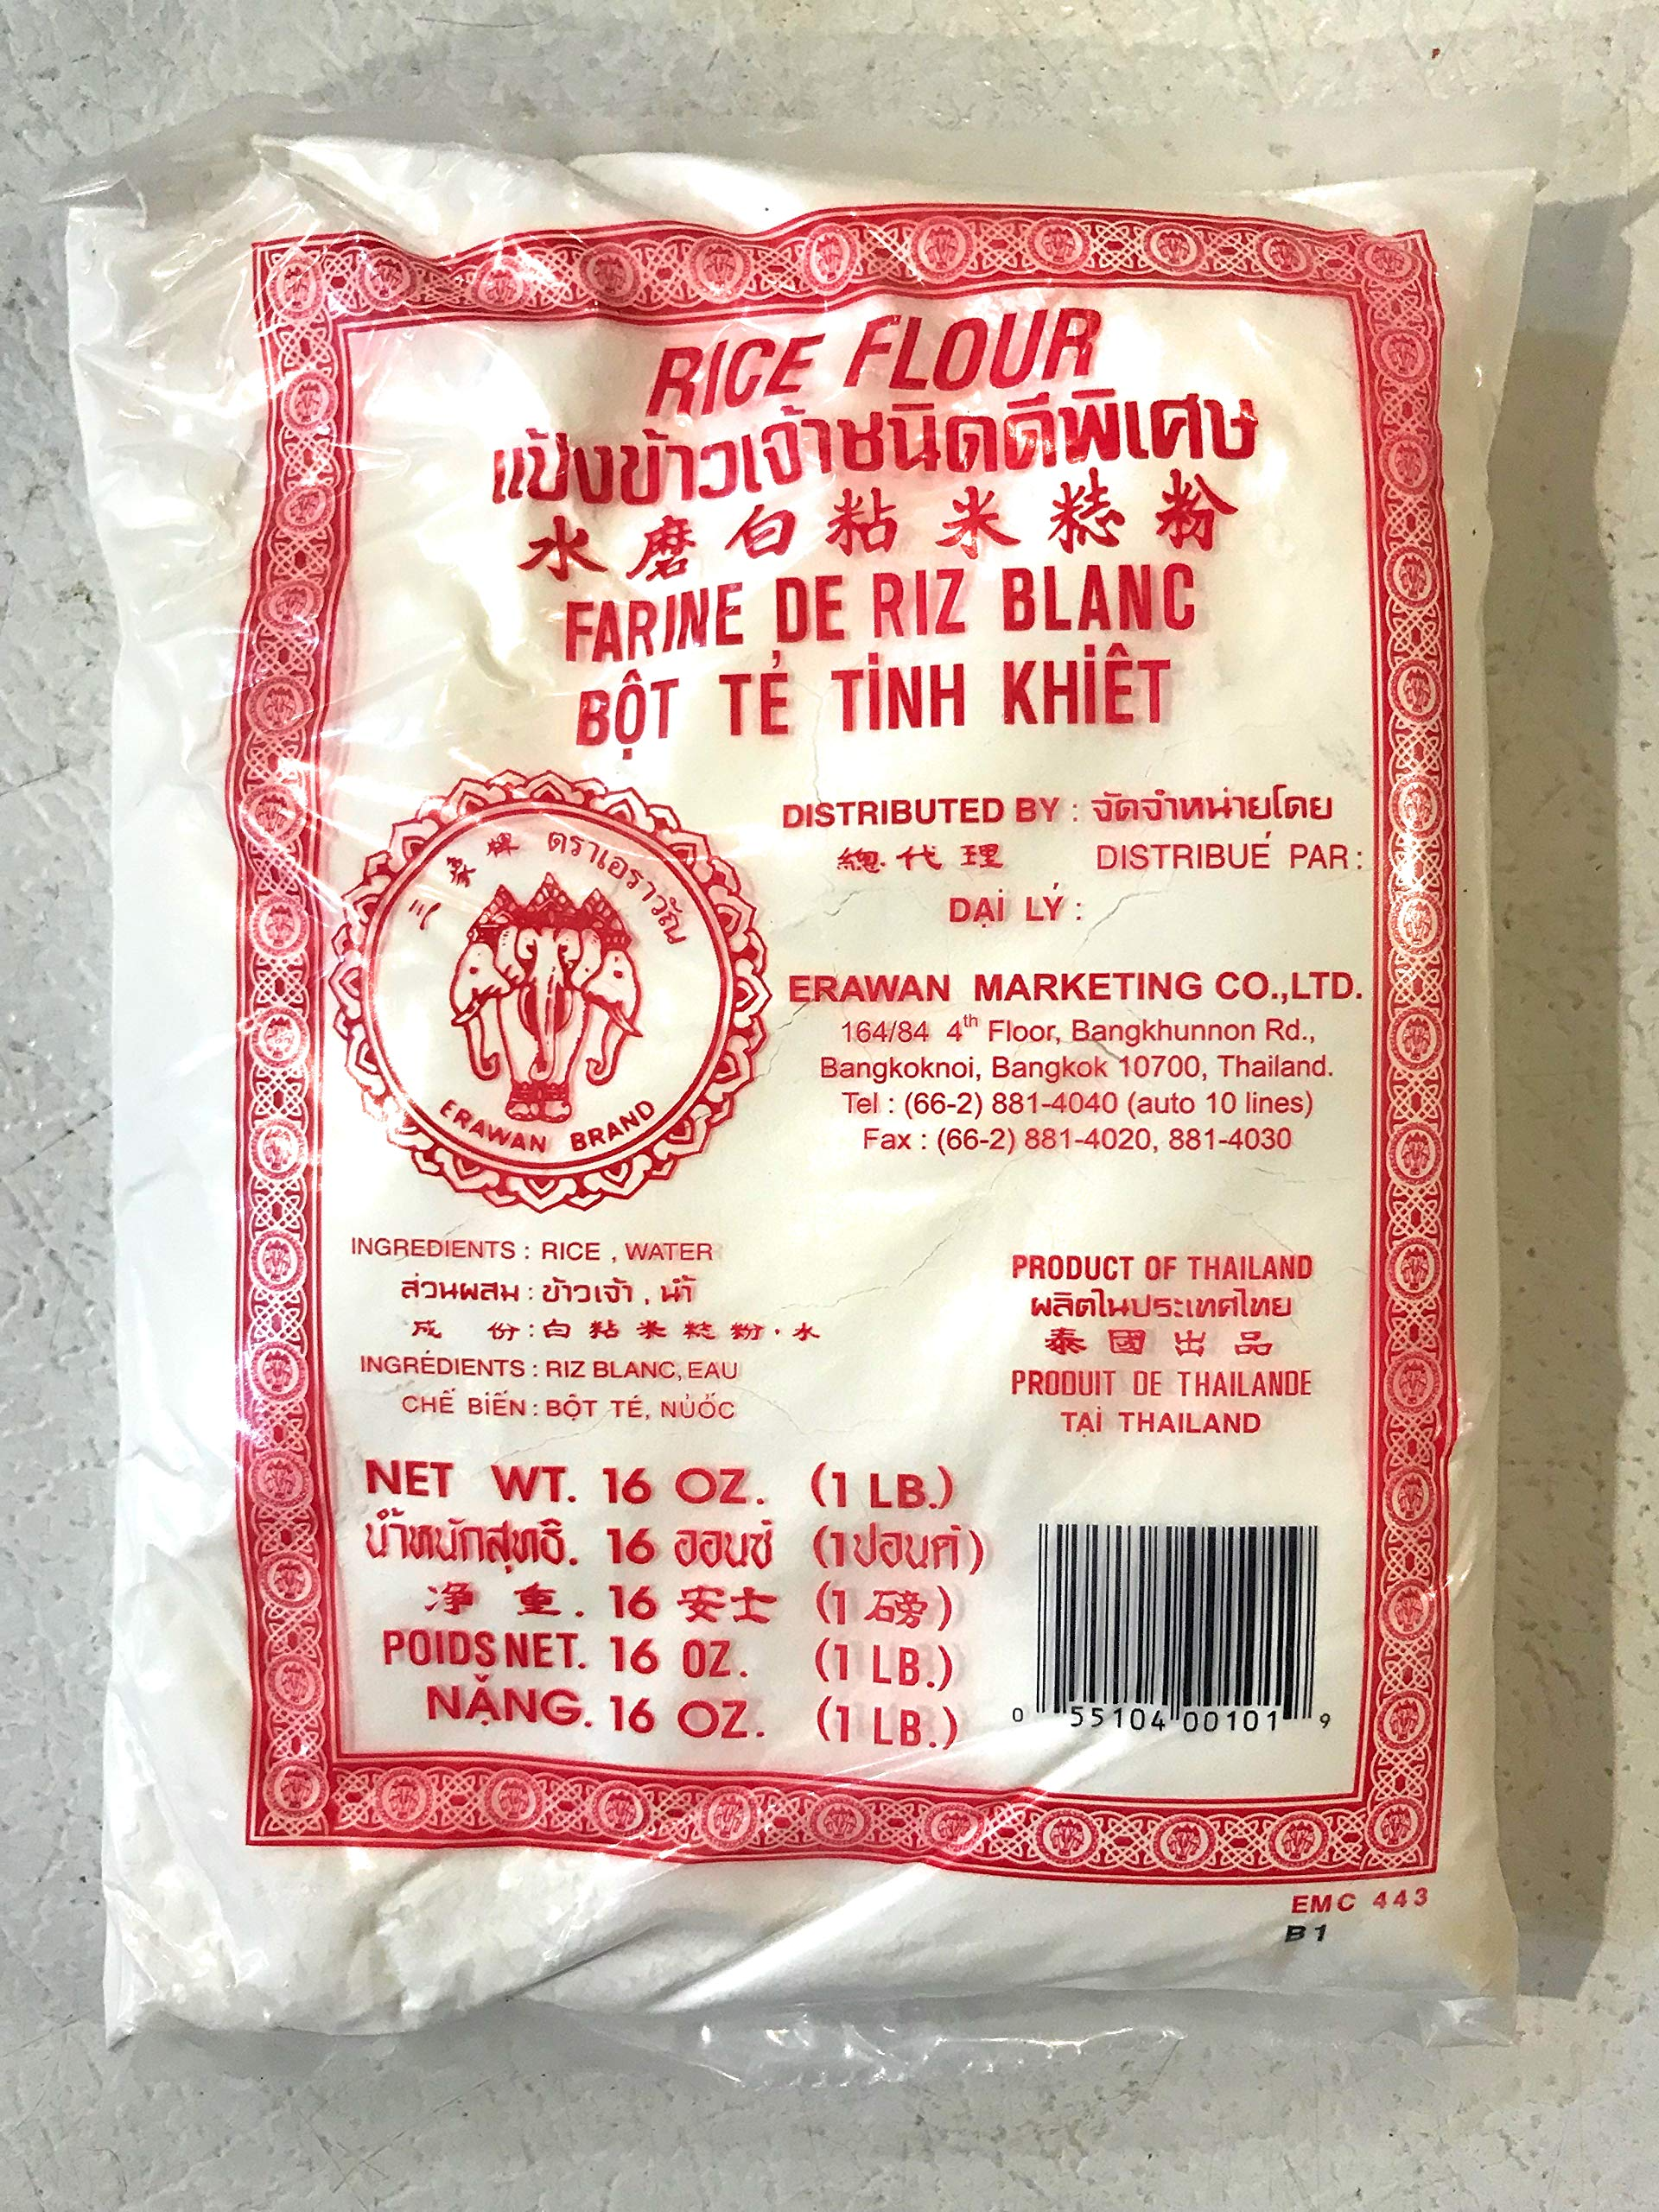 Rice Flour 1 LB x 20 Bags 水磨白粘米広粉